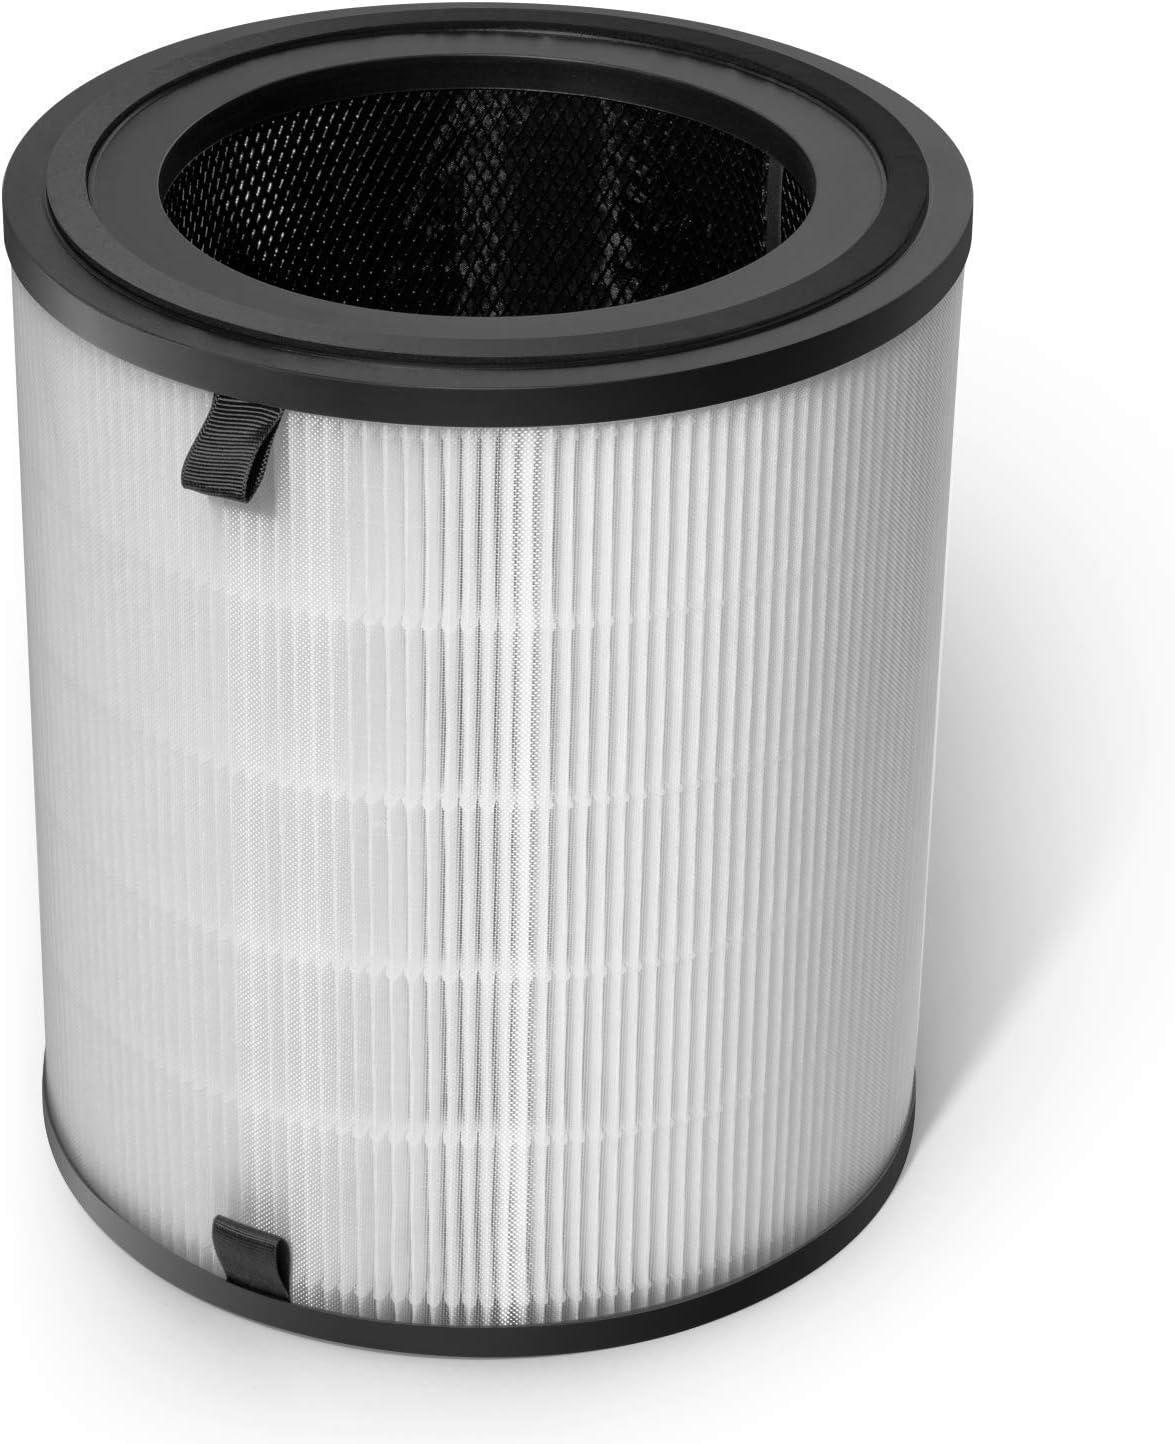 FAMTOP FAM-D03 Purificador de aire 4 en 1, filtro HEPA auténtico ...